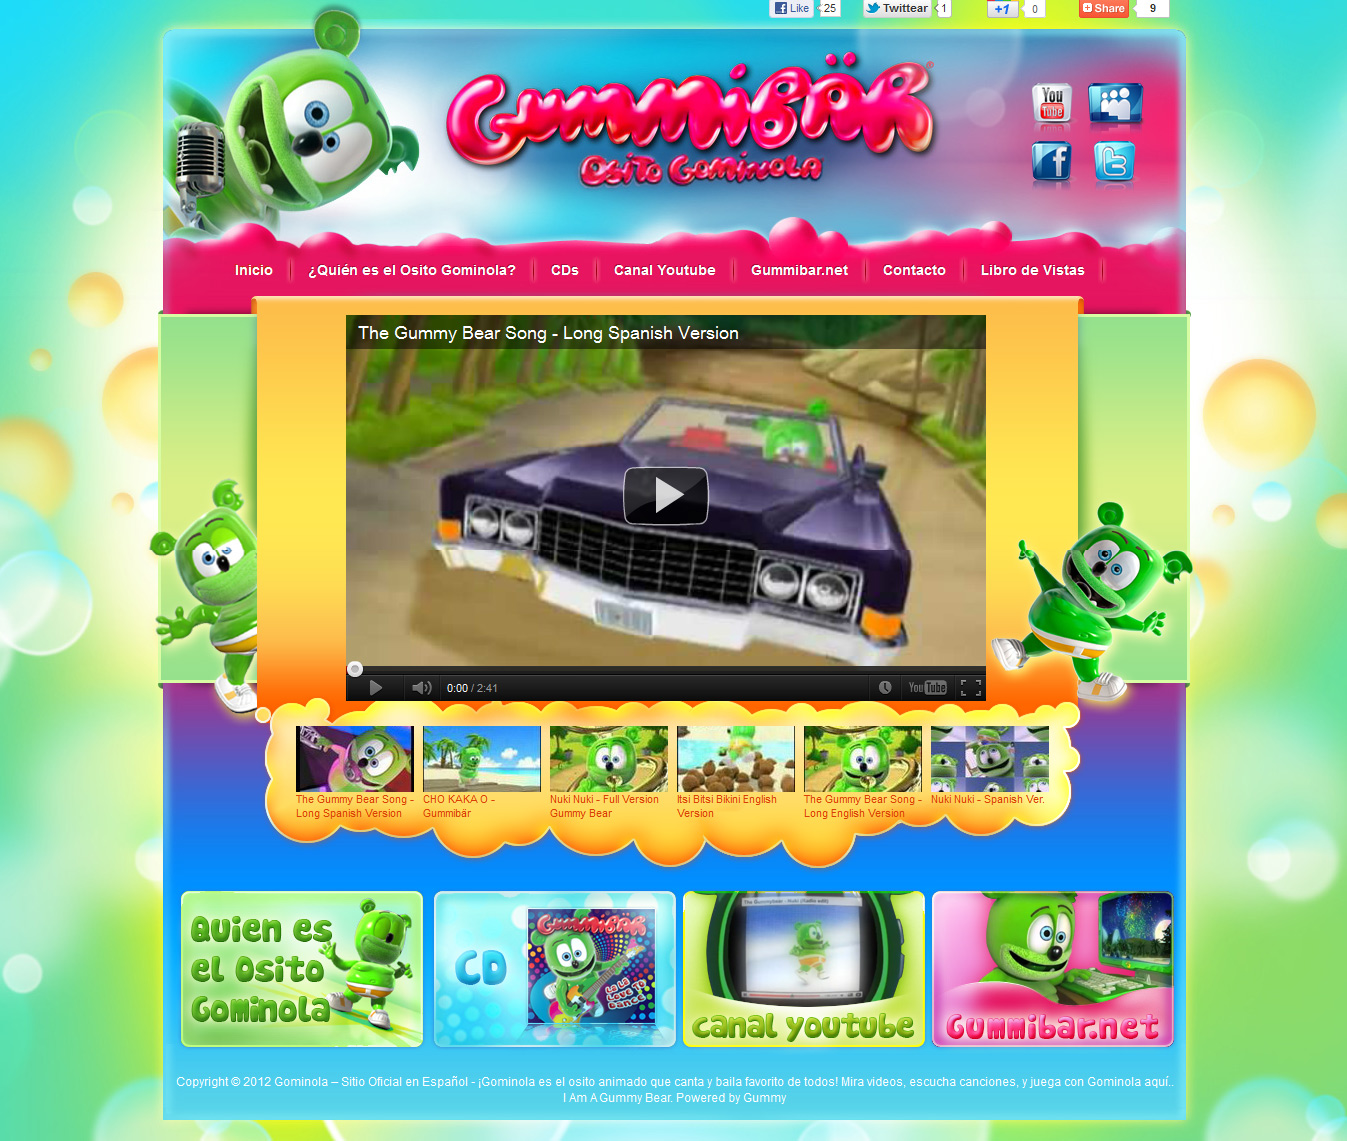 Spanish Language Website For Animated Gummy Bear Character Gummib R